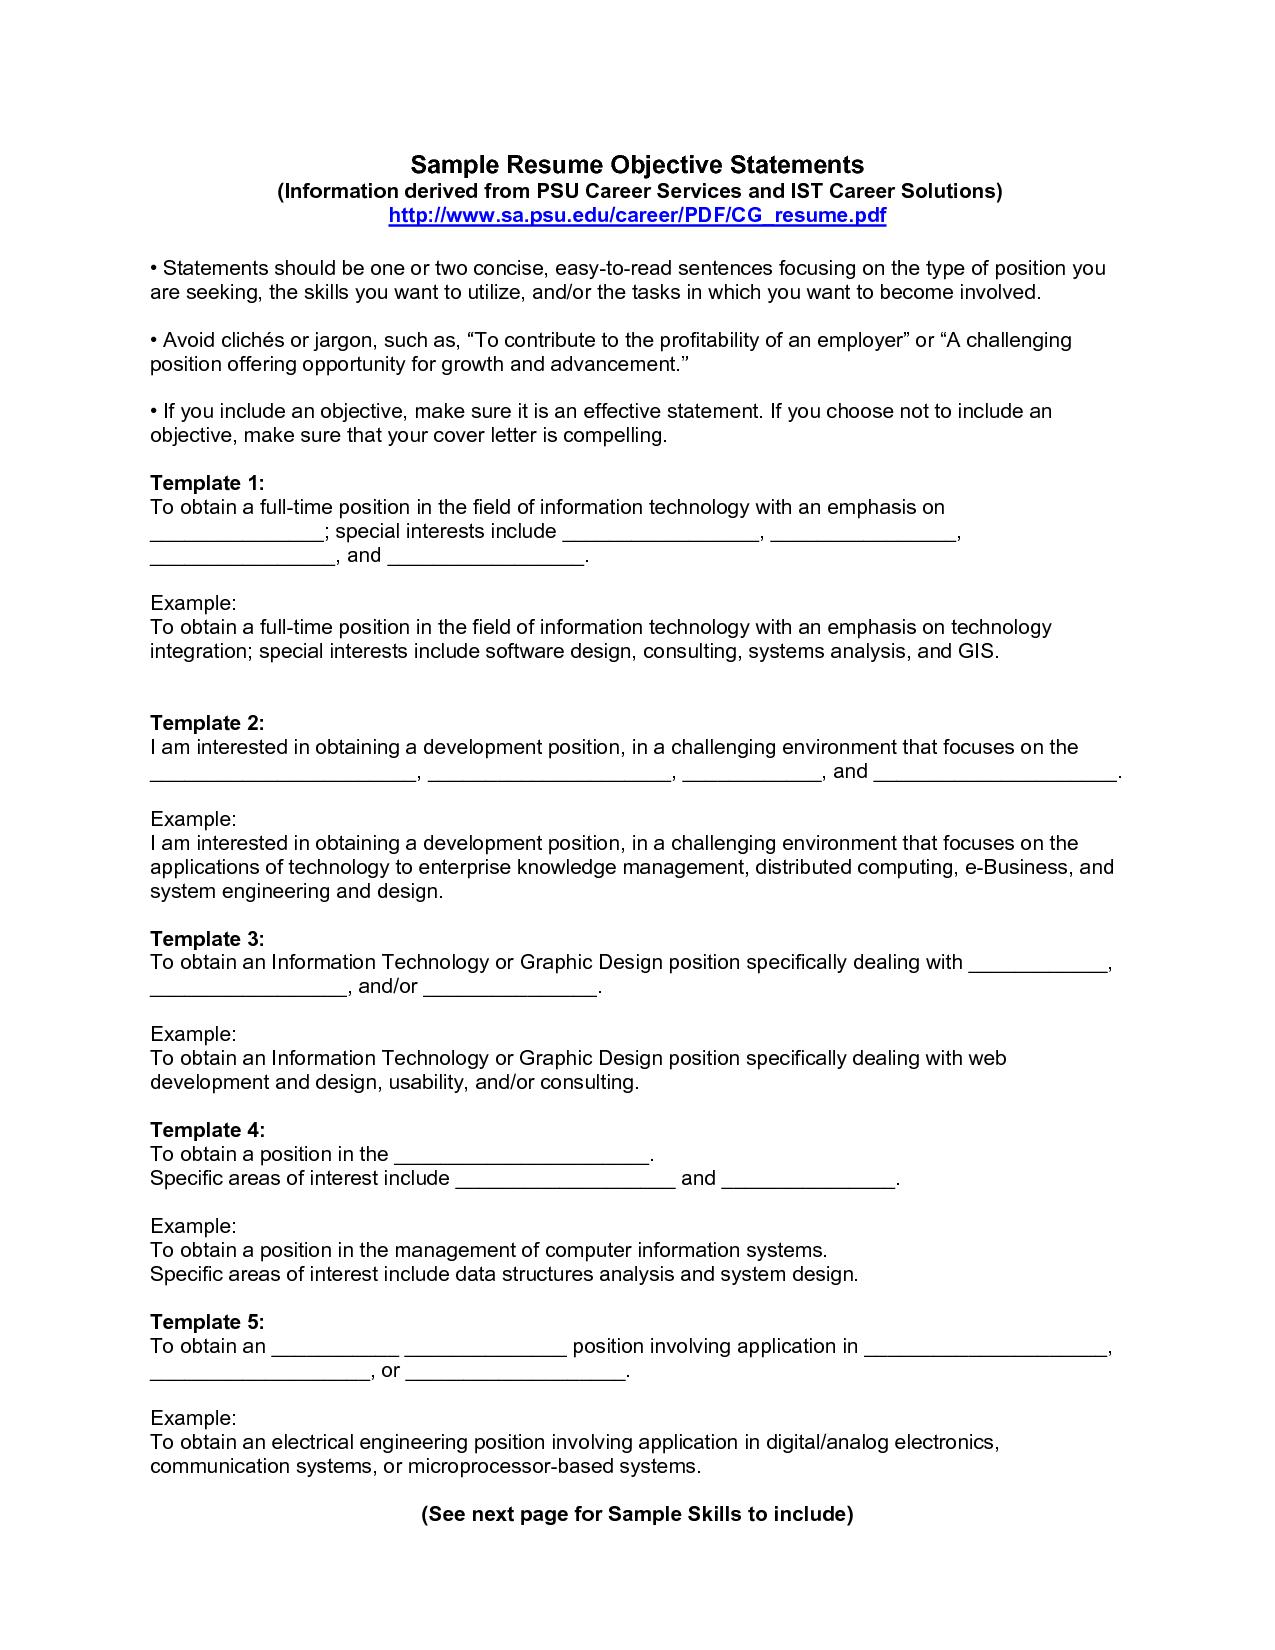 name address phone career objective international business